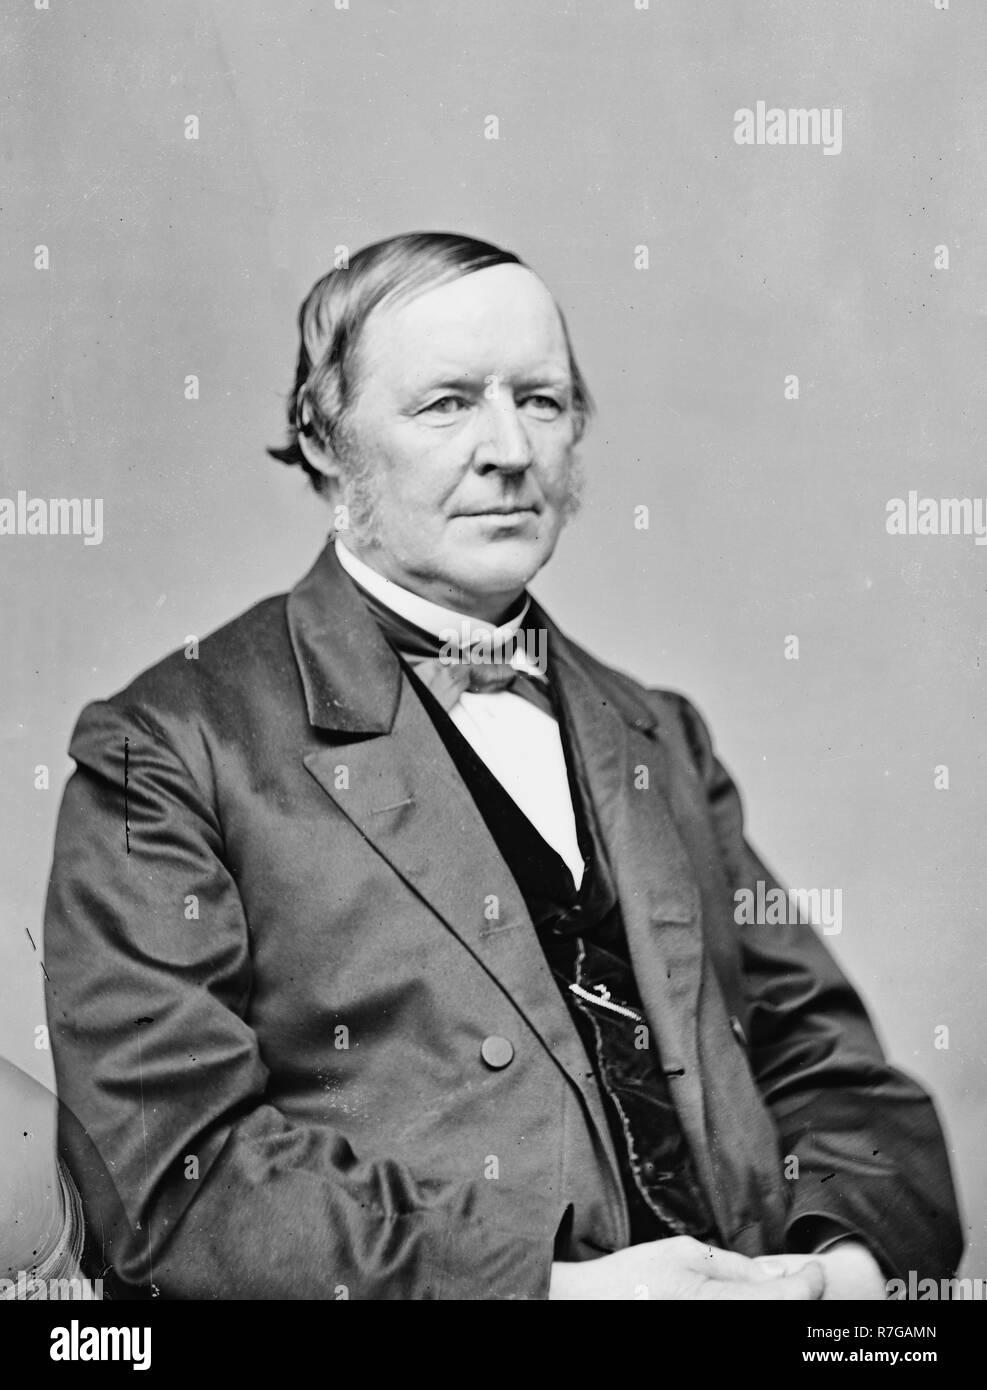 Portrait of Hugh McCulloch, Secretary of the U.S. Treasury, circa 1865 - Stock Image